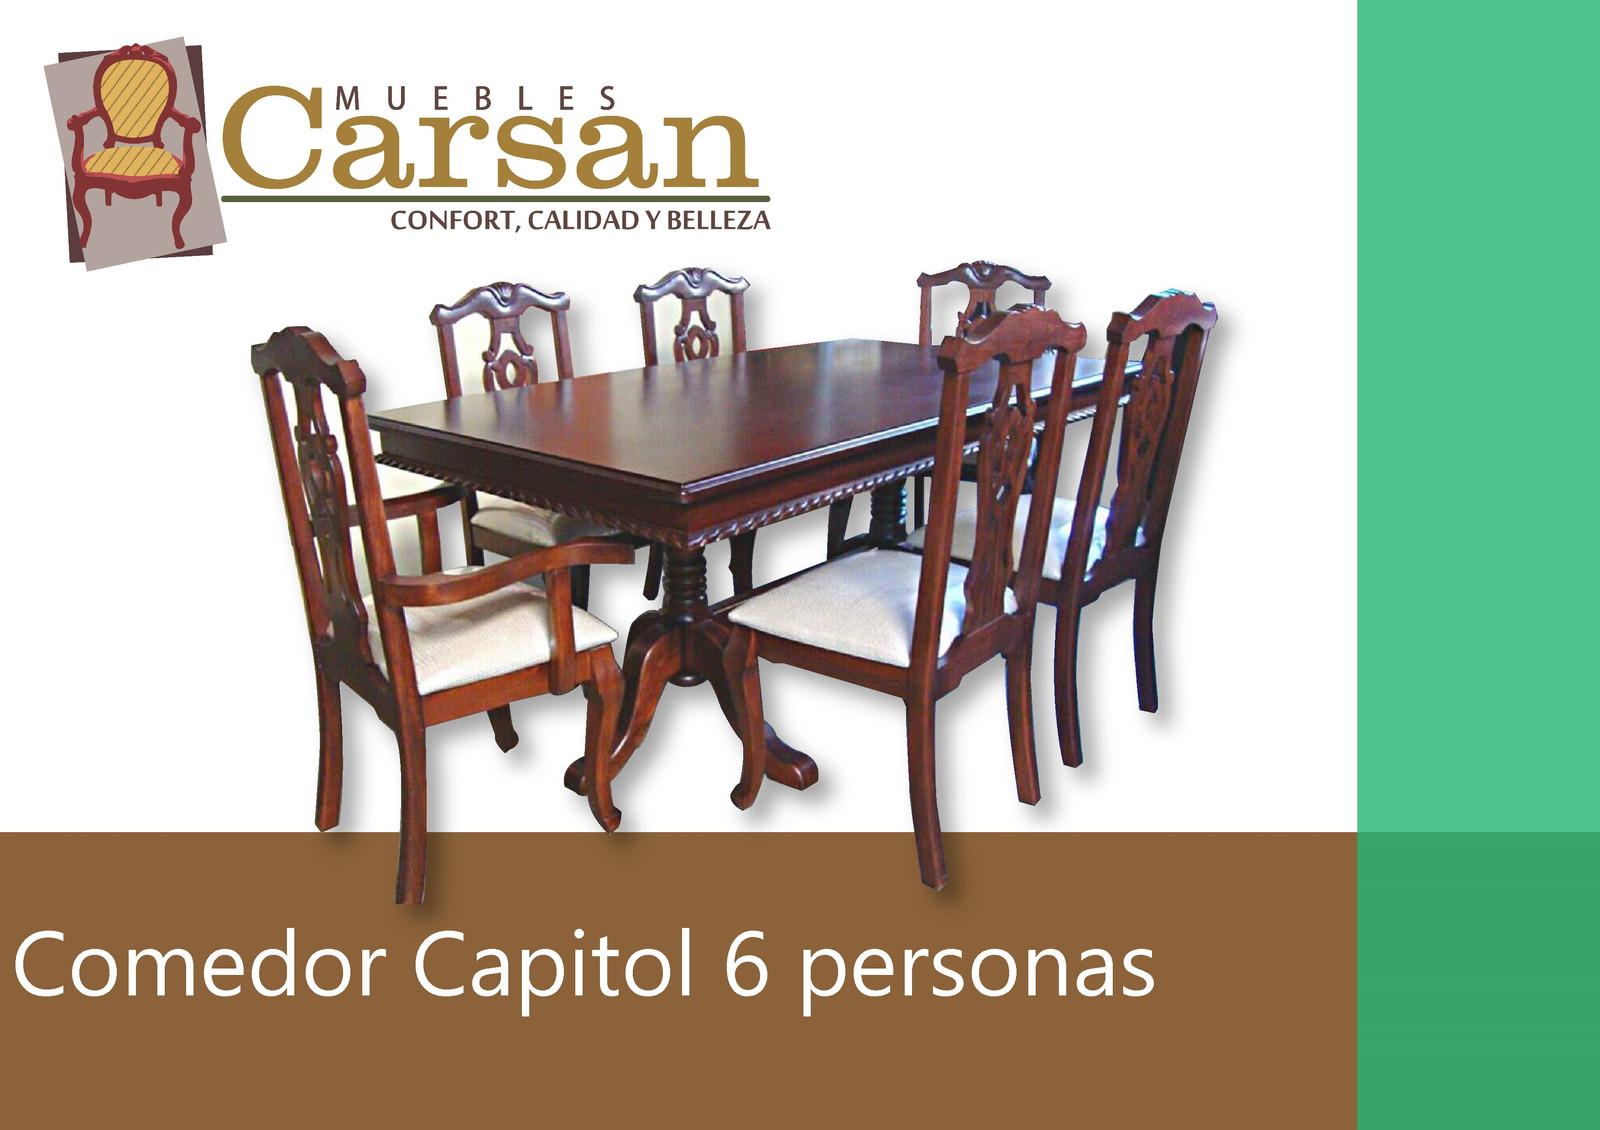 Comedor capitol 6 personas muebles carsan inicio for Muebles capitol